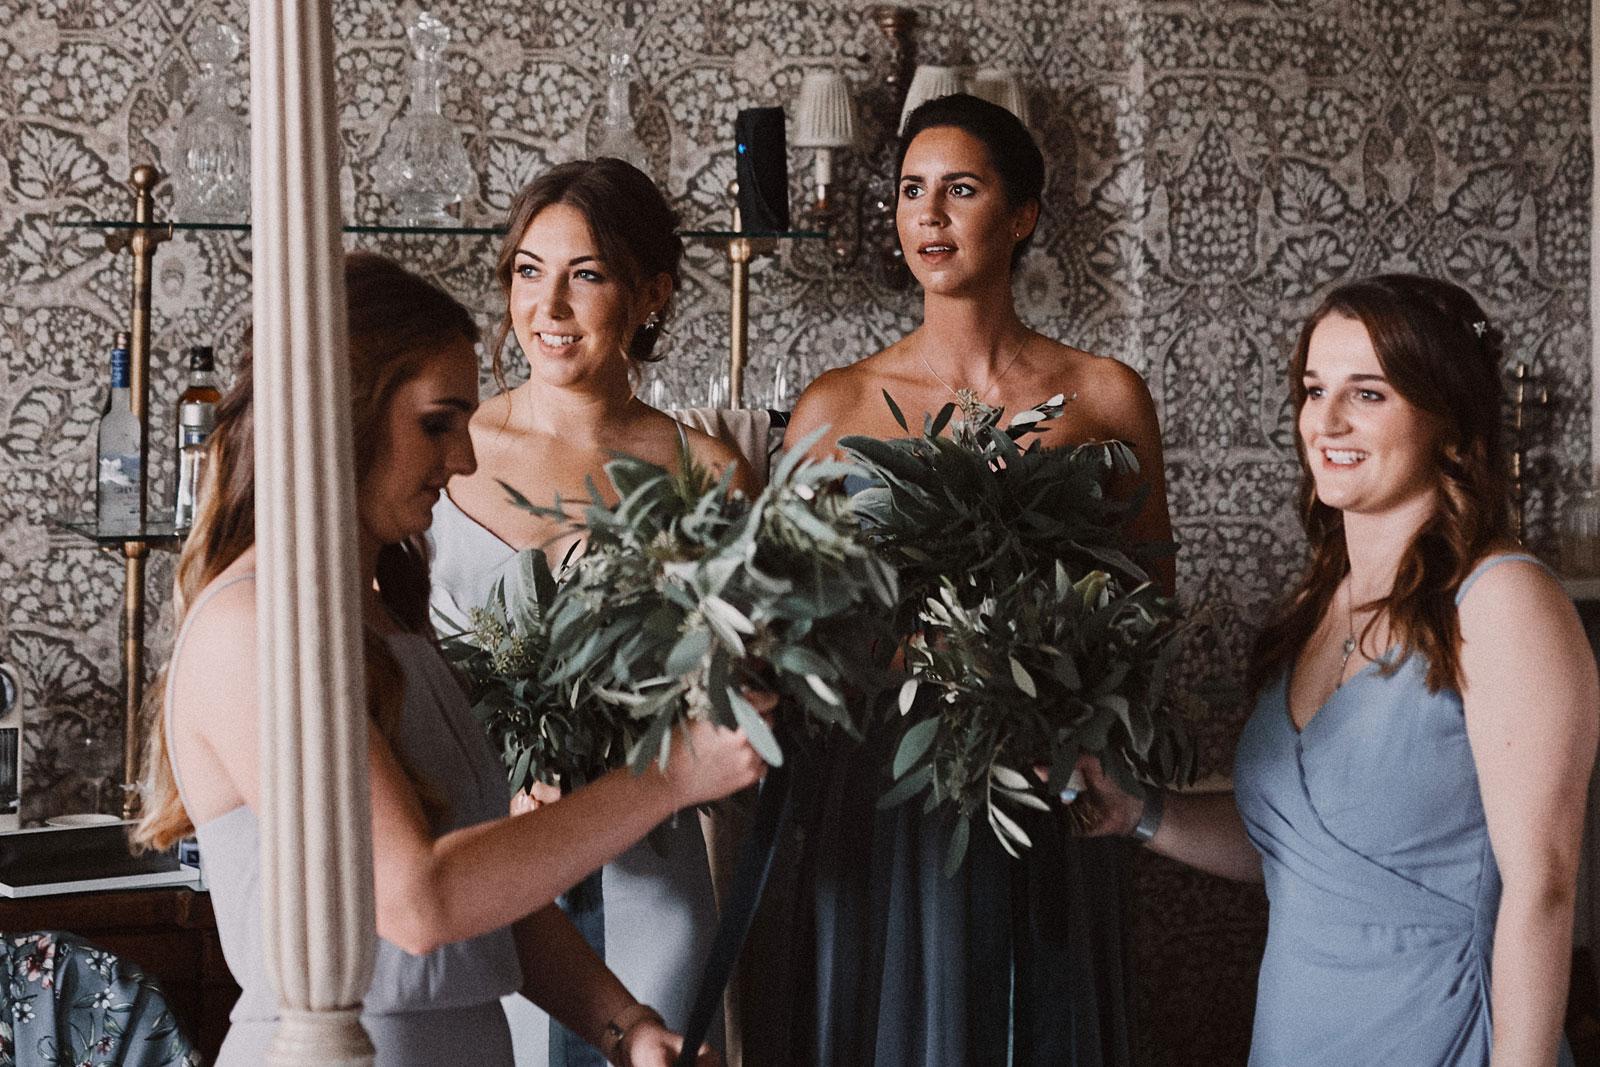 Bridesmaids, Will you be my Bridesmaid, Bridesmaid, Bridesmaid Proposal, Lockdown Bridesmaid Proposal, Bridal Party, Maid of Honour